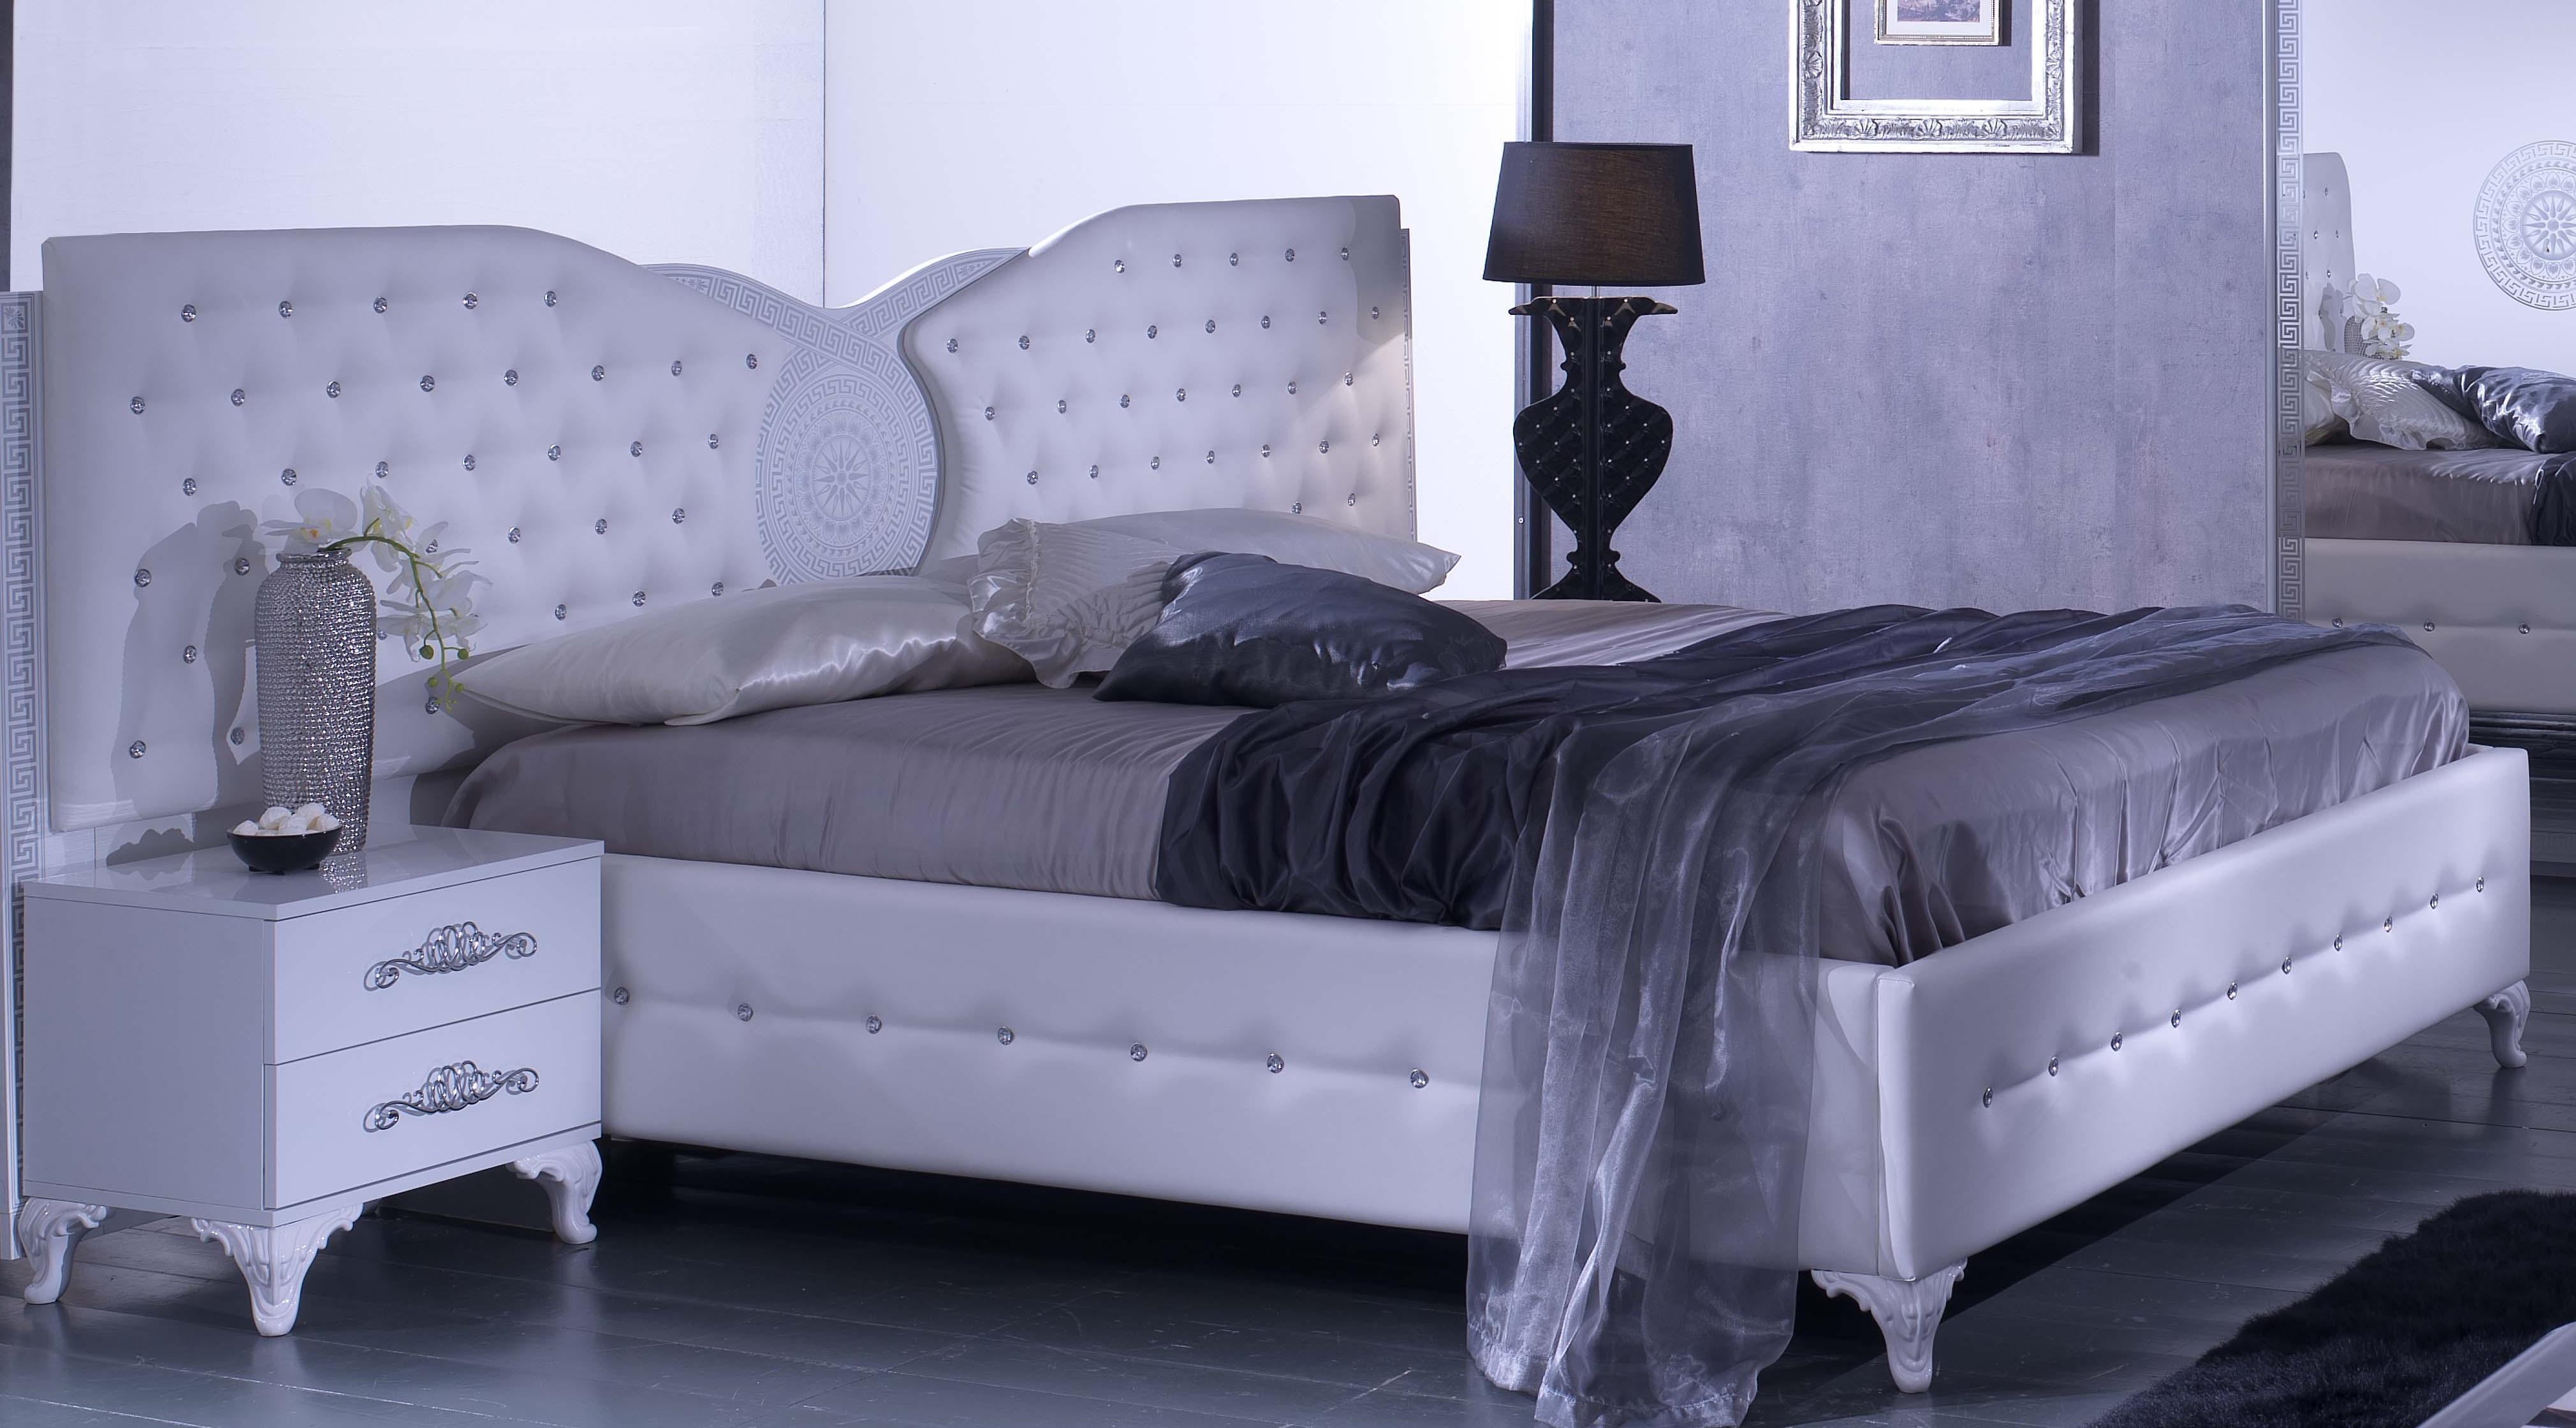 Bett 160x200 Cm Anatalia In Weiss Silber Modern Ebay